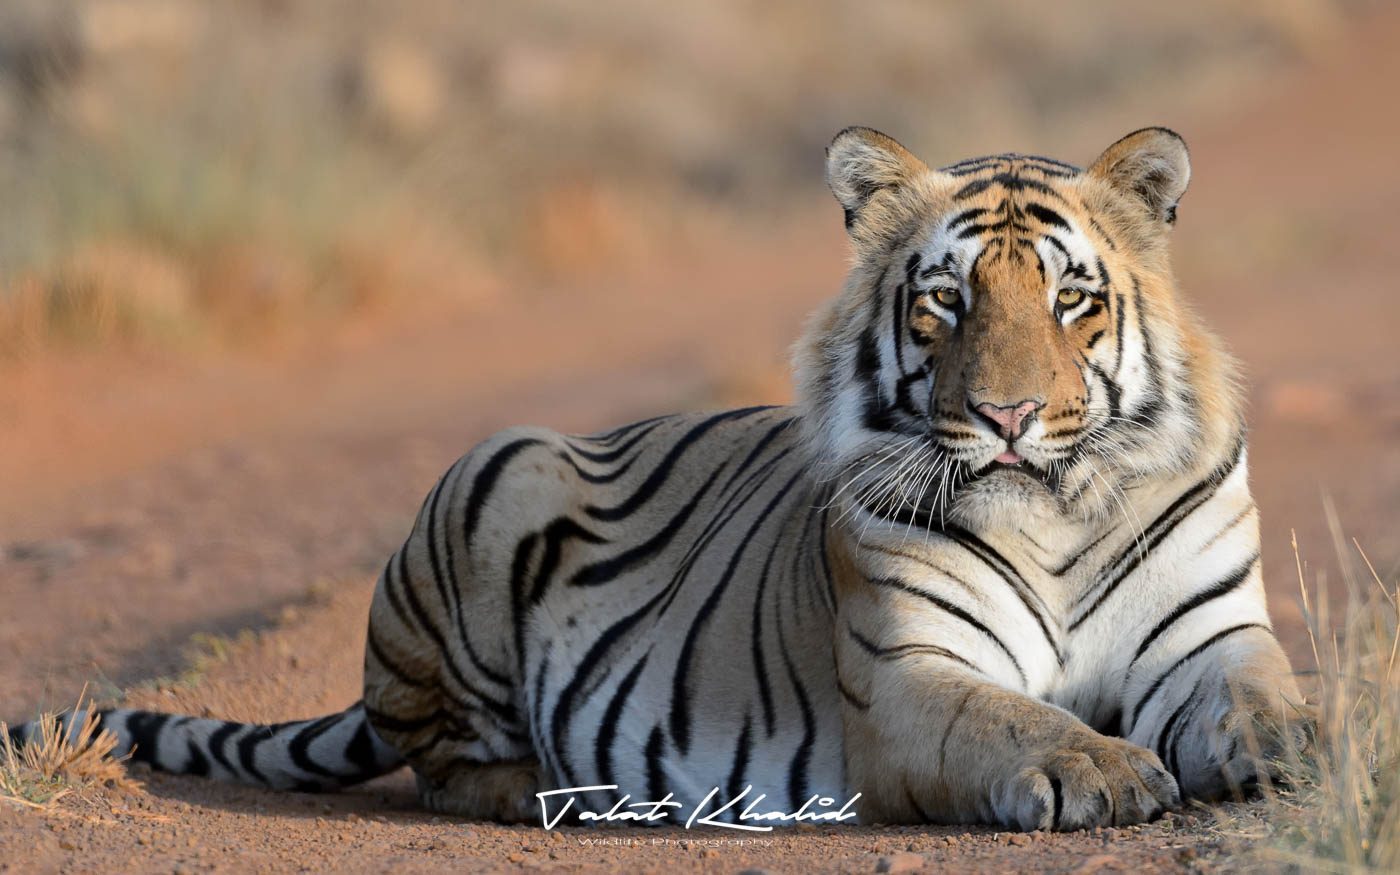 tiger king - photo #27